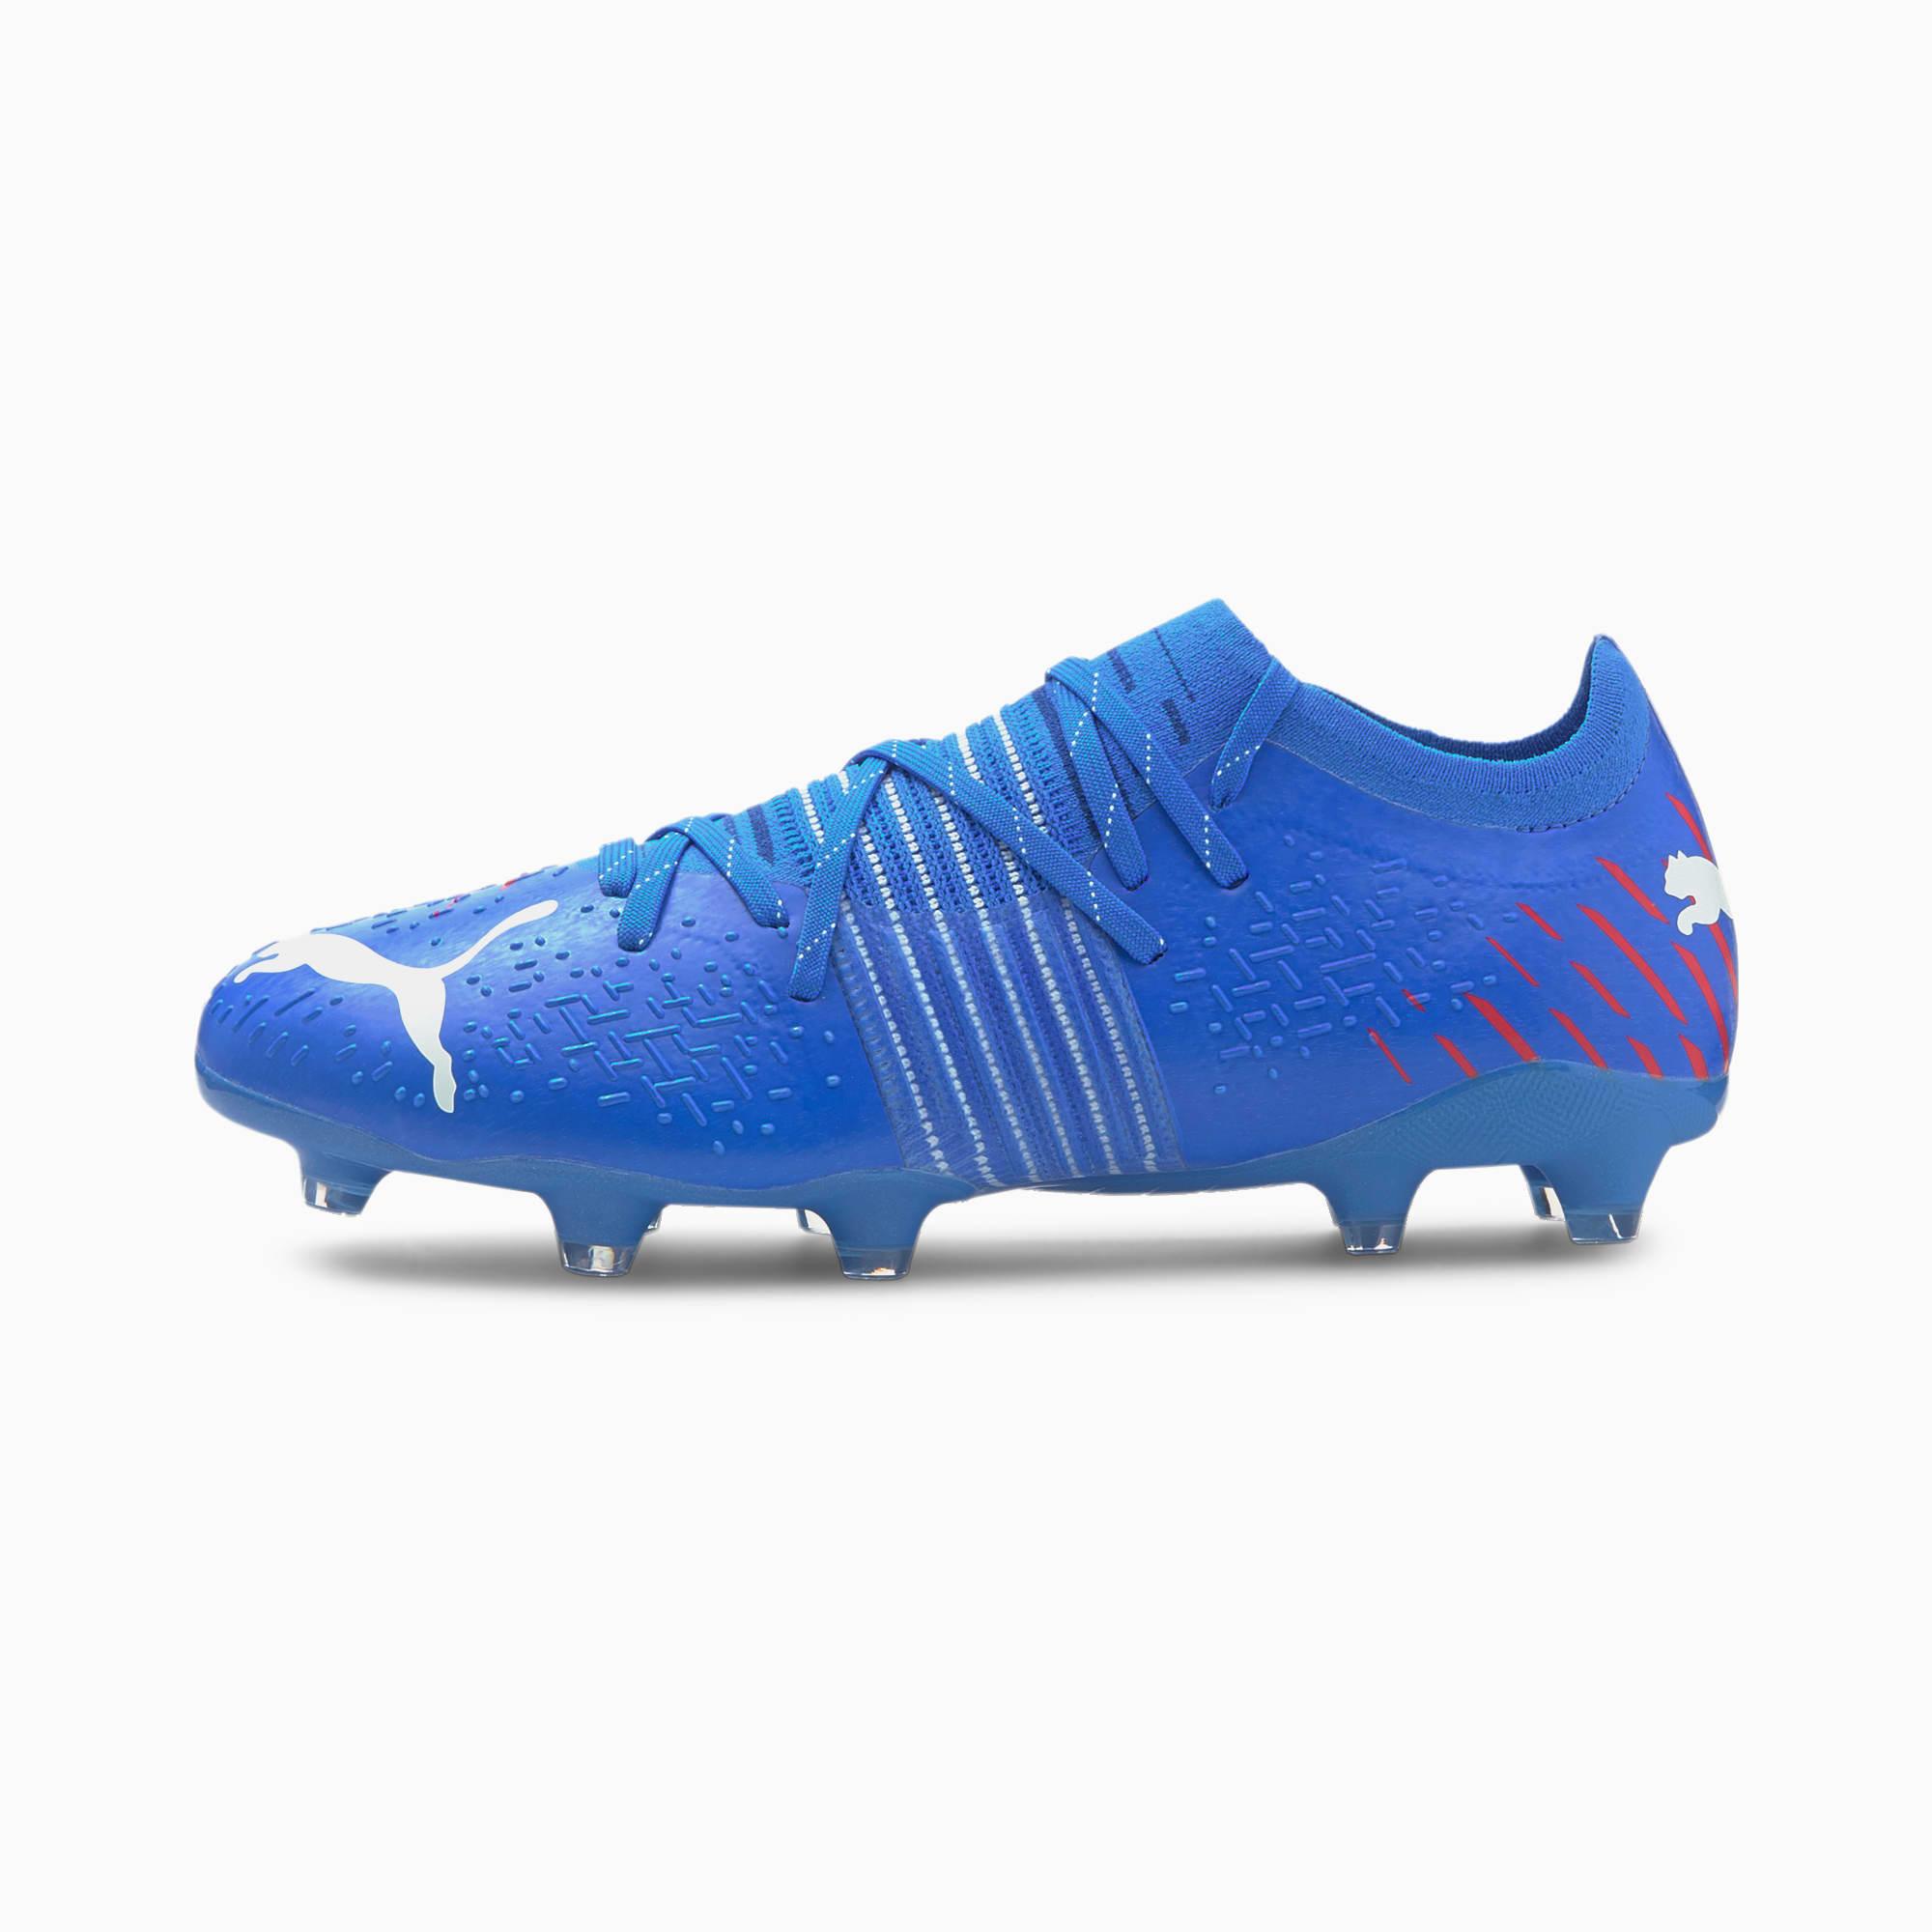 Future Z 2.2 FG/AG Men's Soccer Cleats